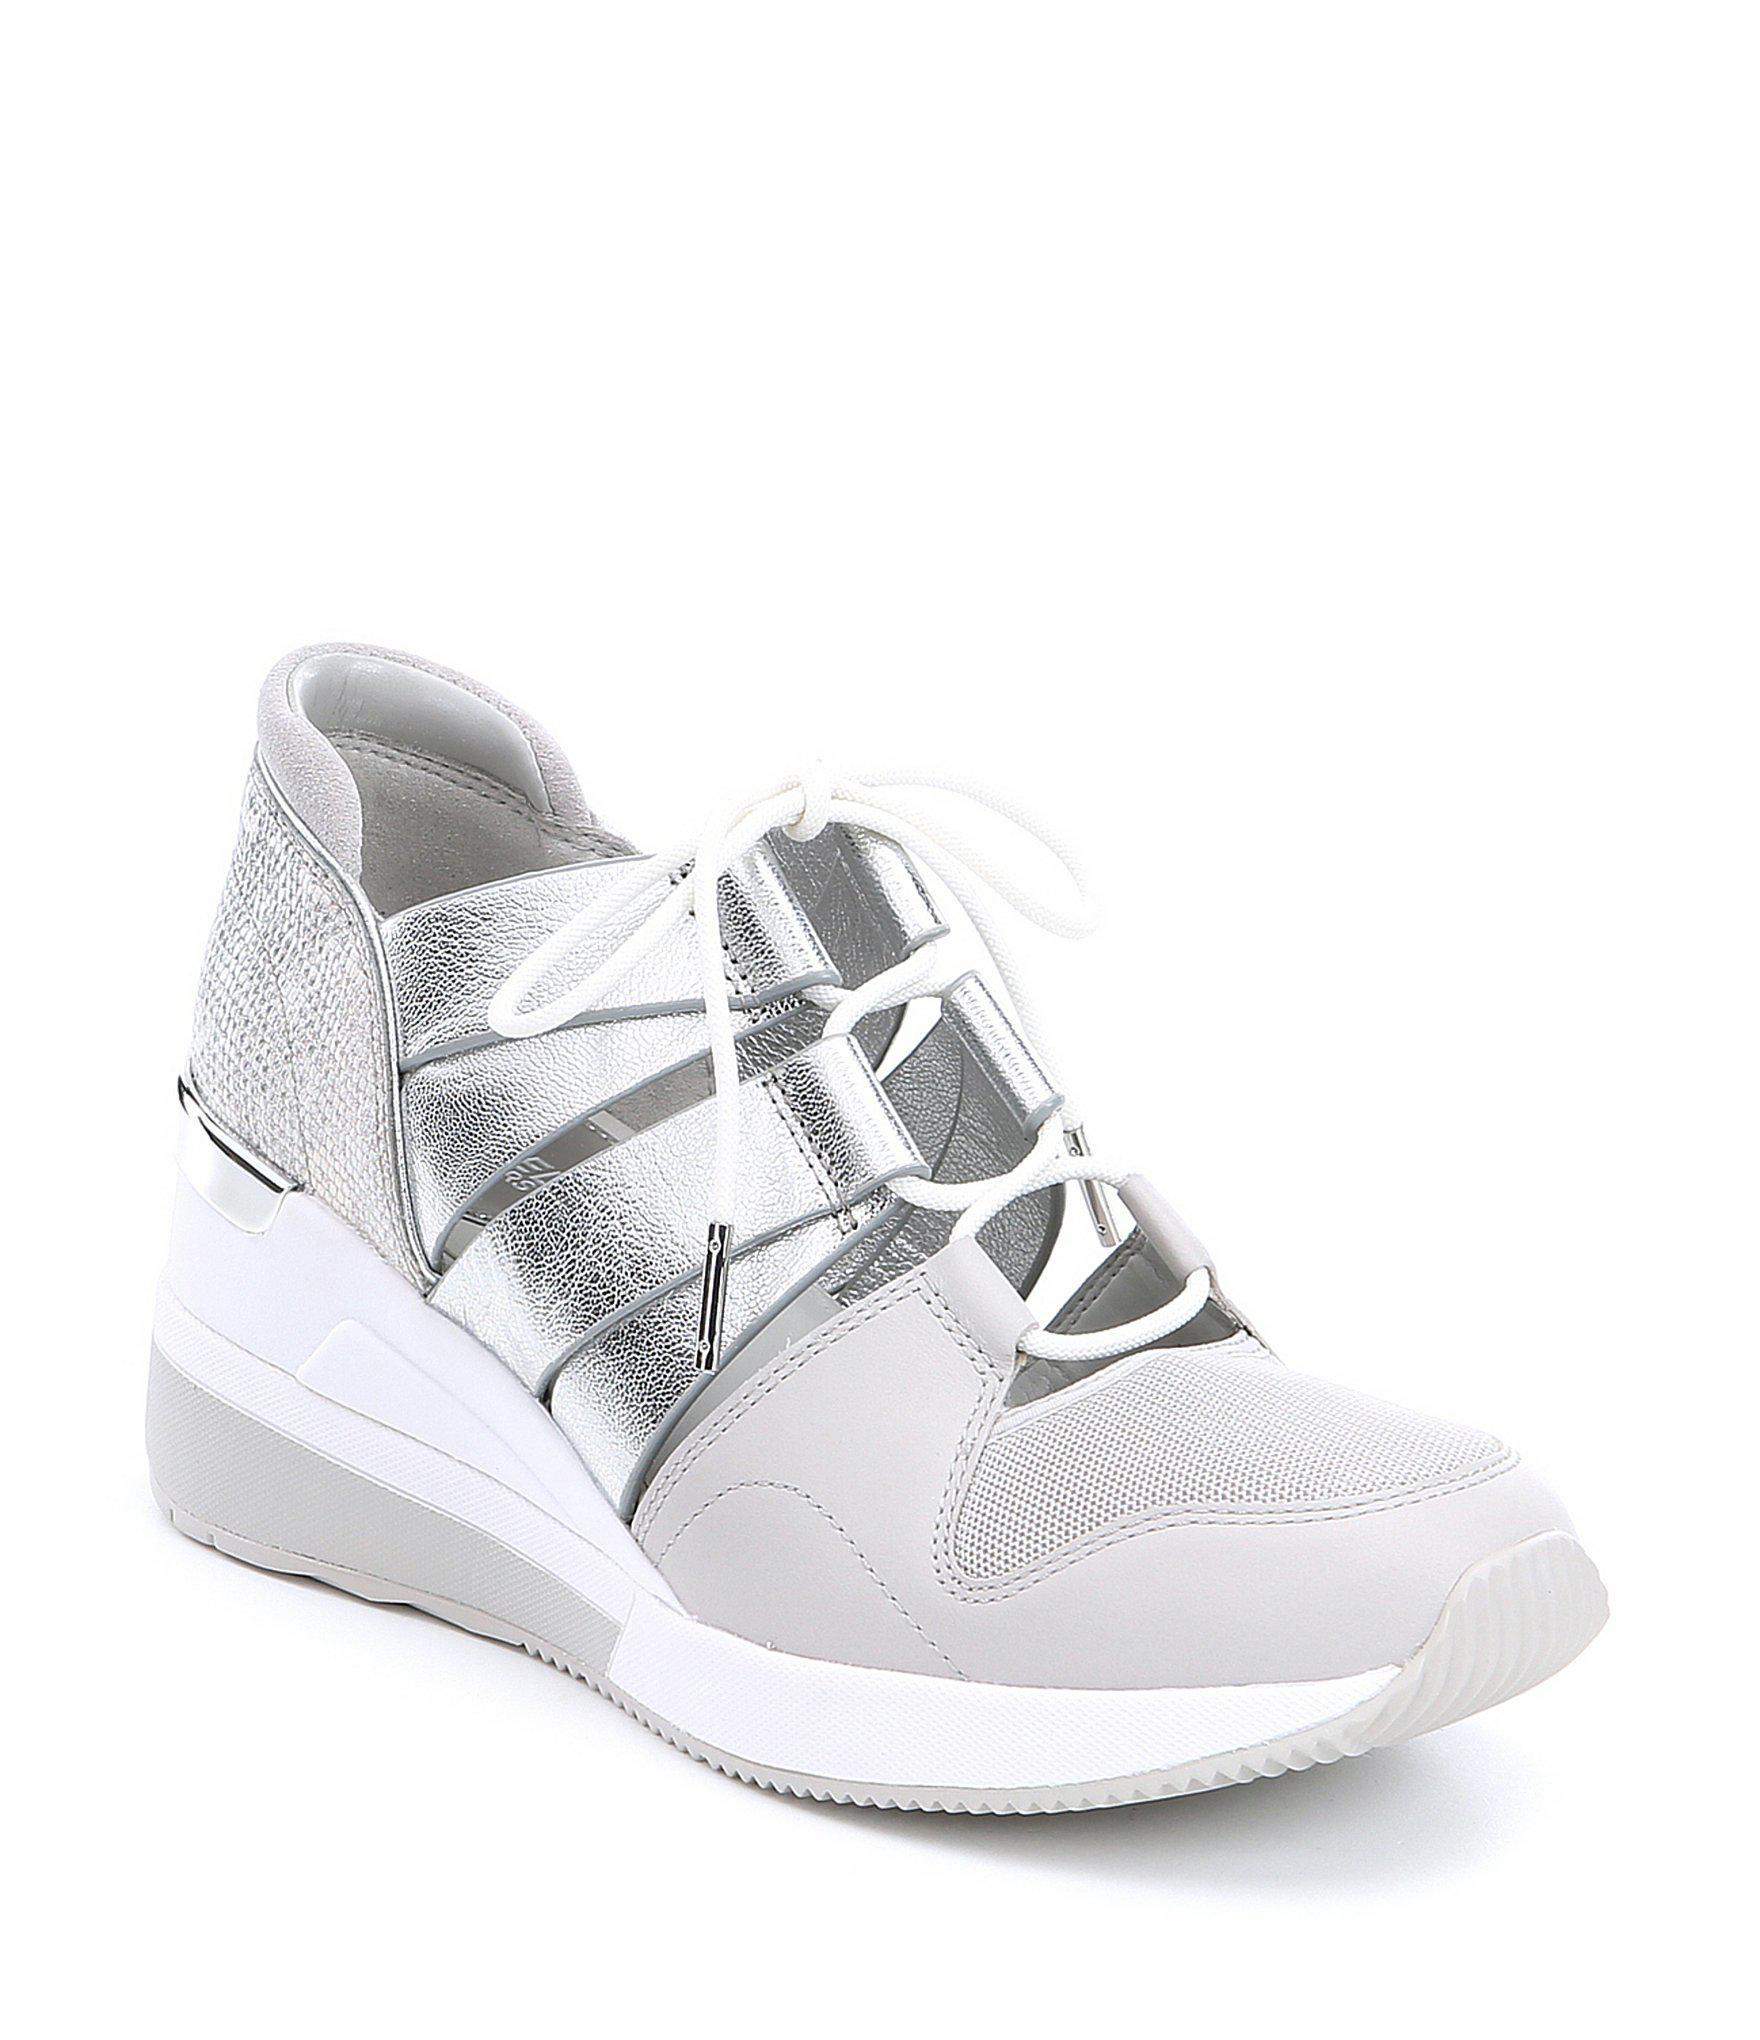 Lyst - MICHAEL Michael Kors Beckett Trainer Sneakers in Metallic 2d07a7b6f